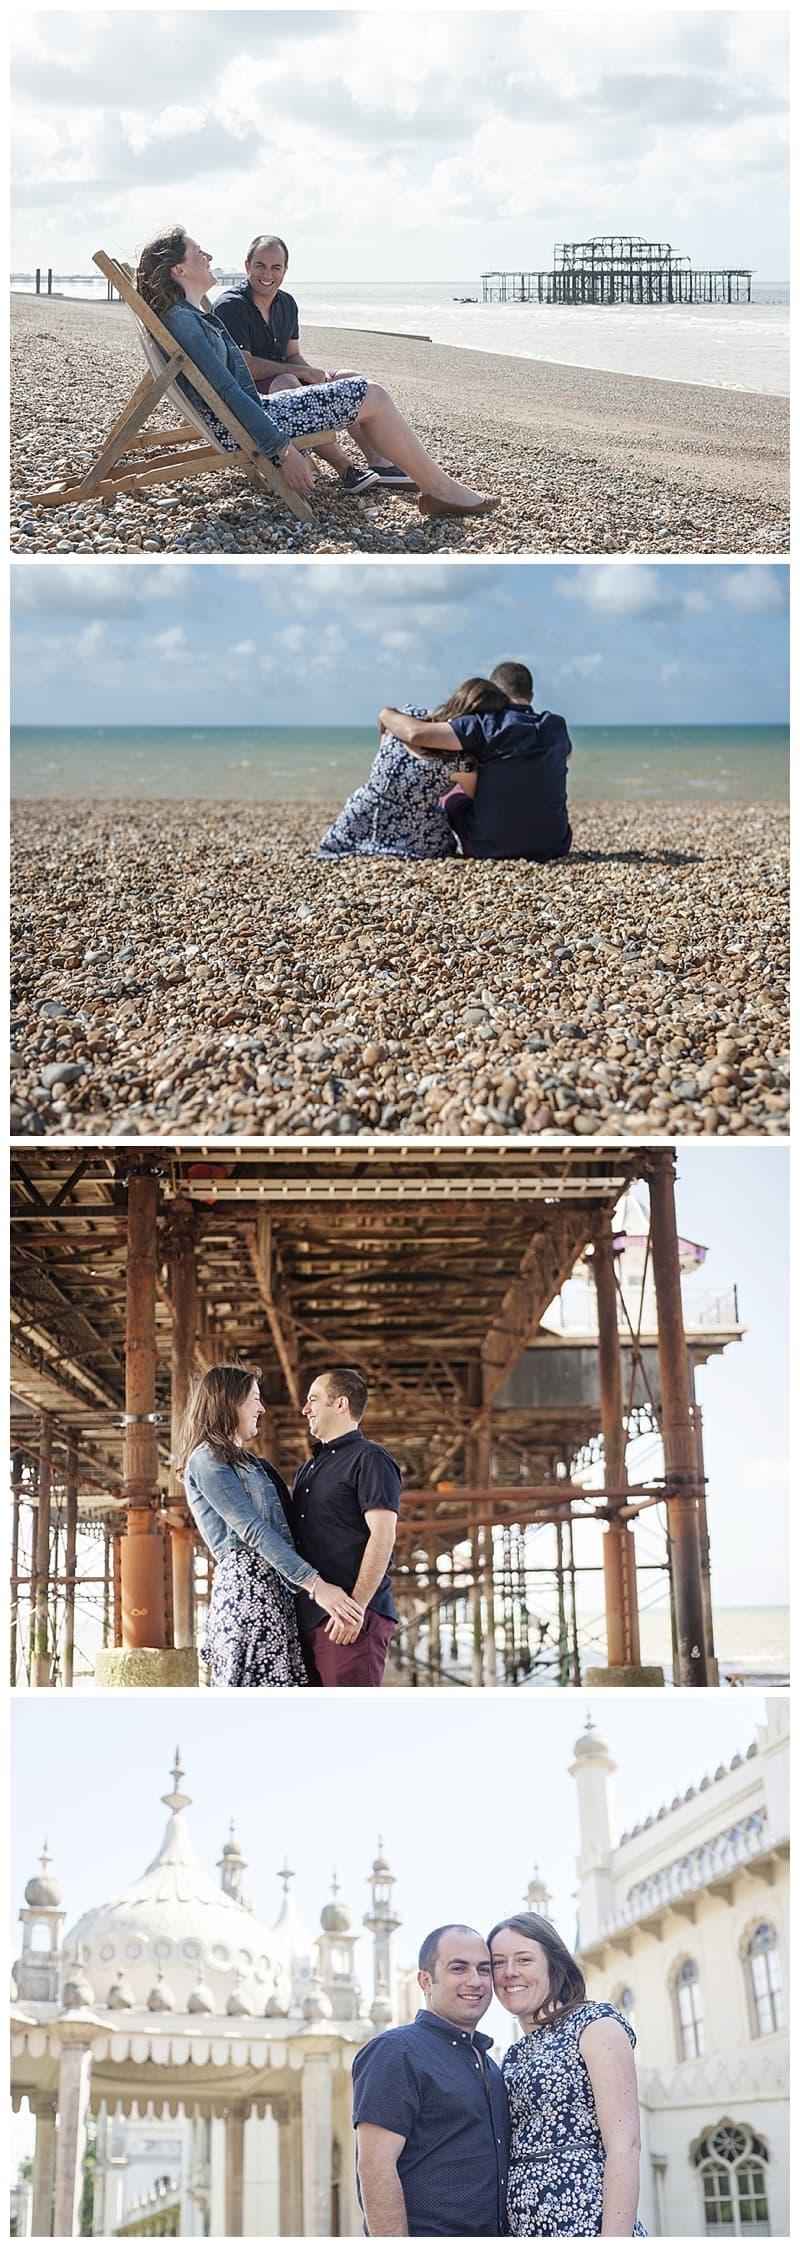 Becca&Fil, Brighton Engagement Photoshoot, Benjamin Wetherall Photography0004